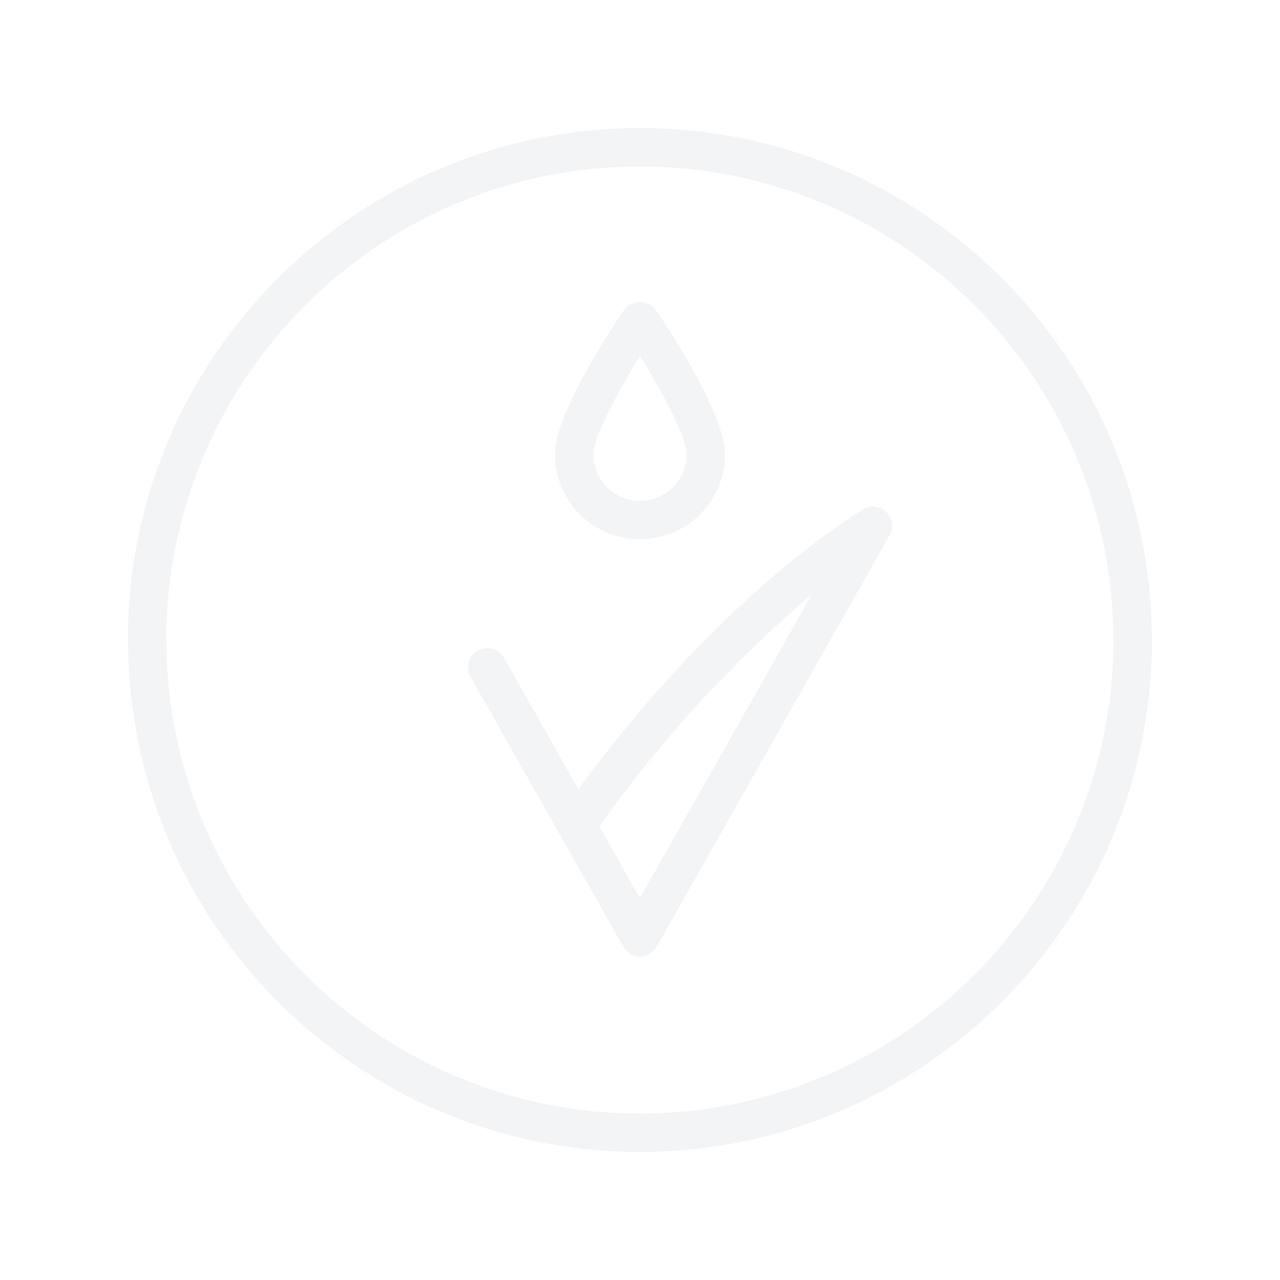 PACO RABANNE Olympea 50ml Eau De Parfum Gift Set